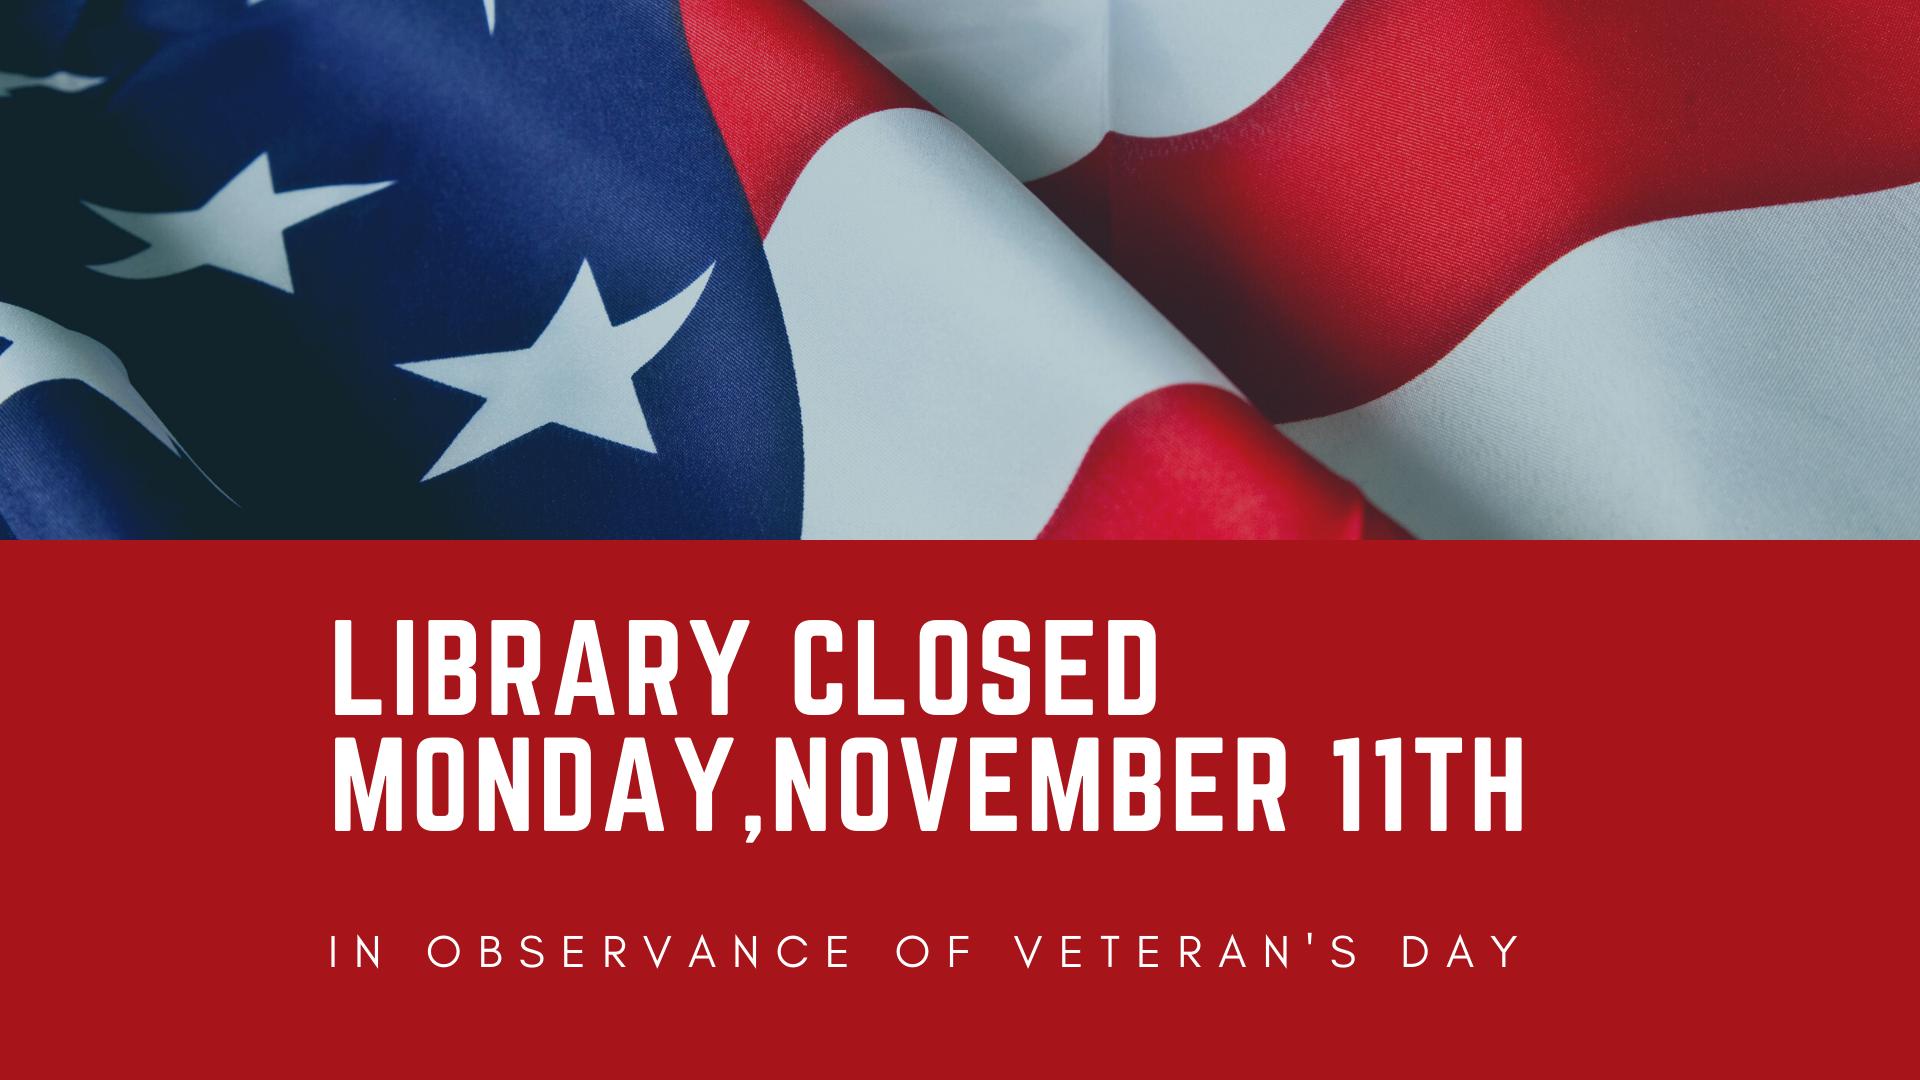 Library Closed November 11, 2019